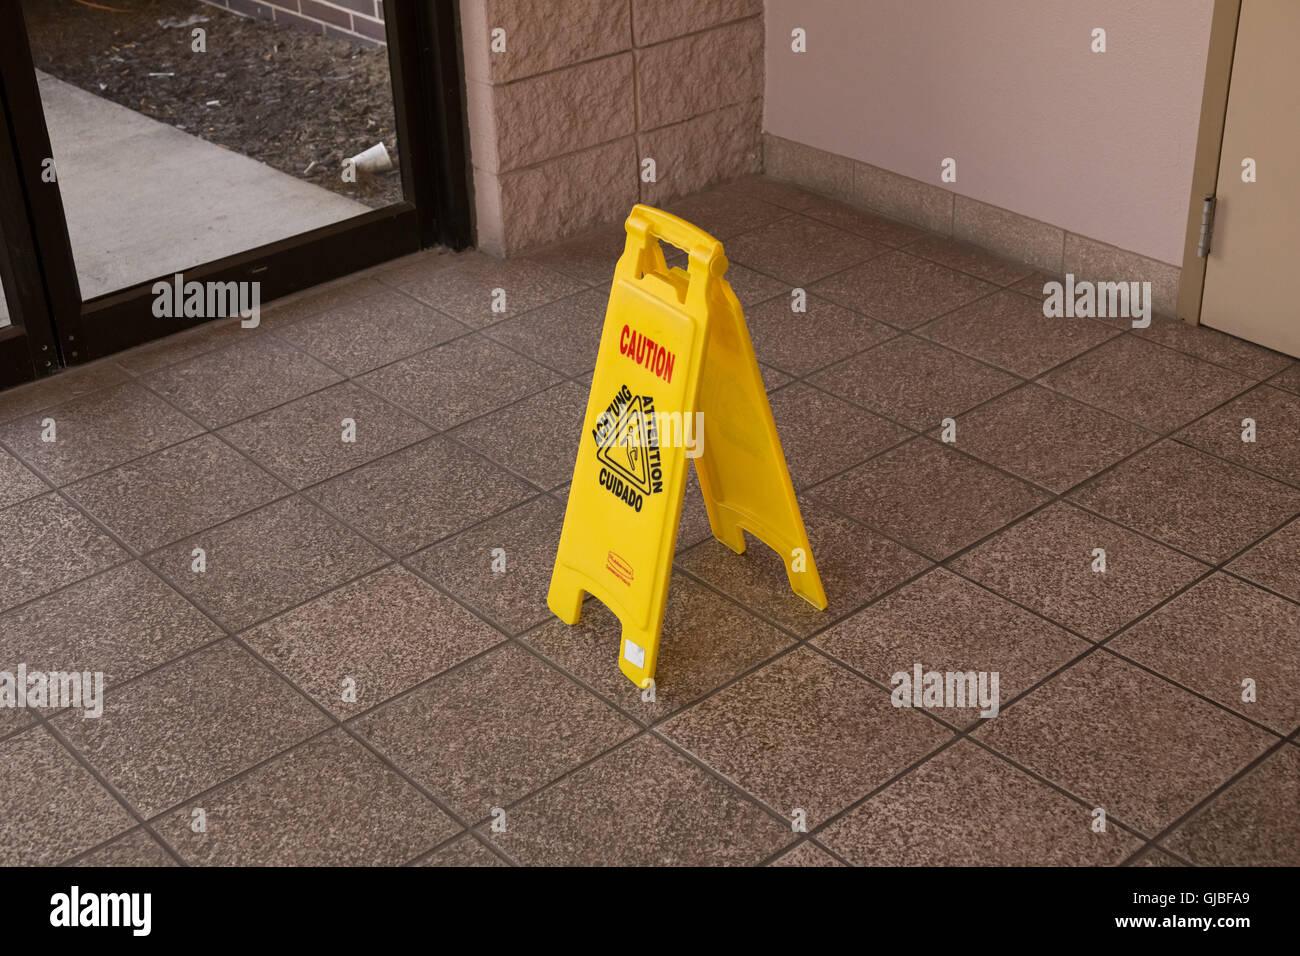 Caution, Slippery Floor, Slippery When Wet, folding warning sign - Stock Image